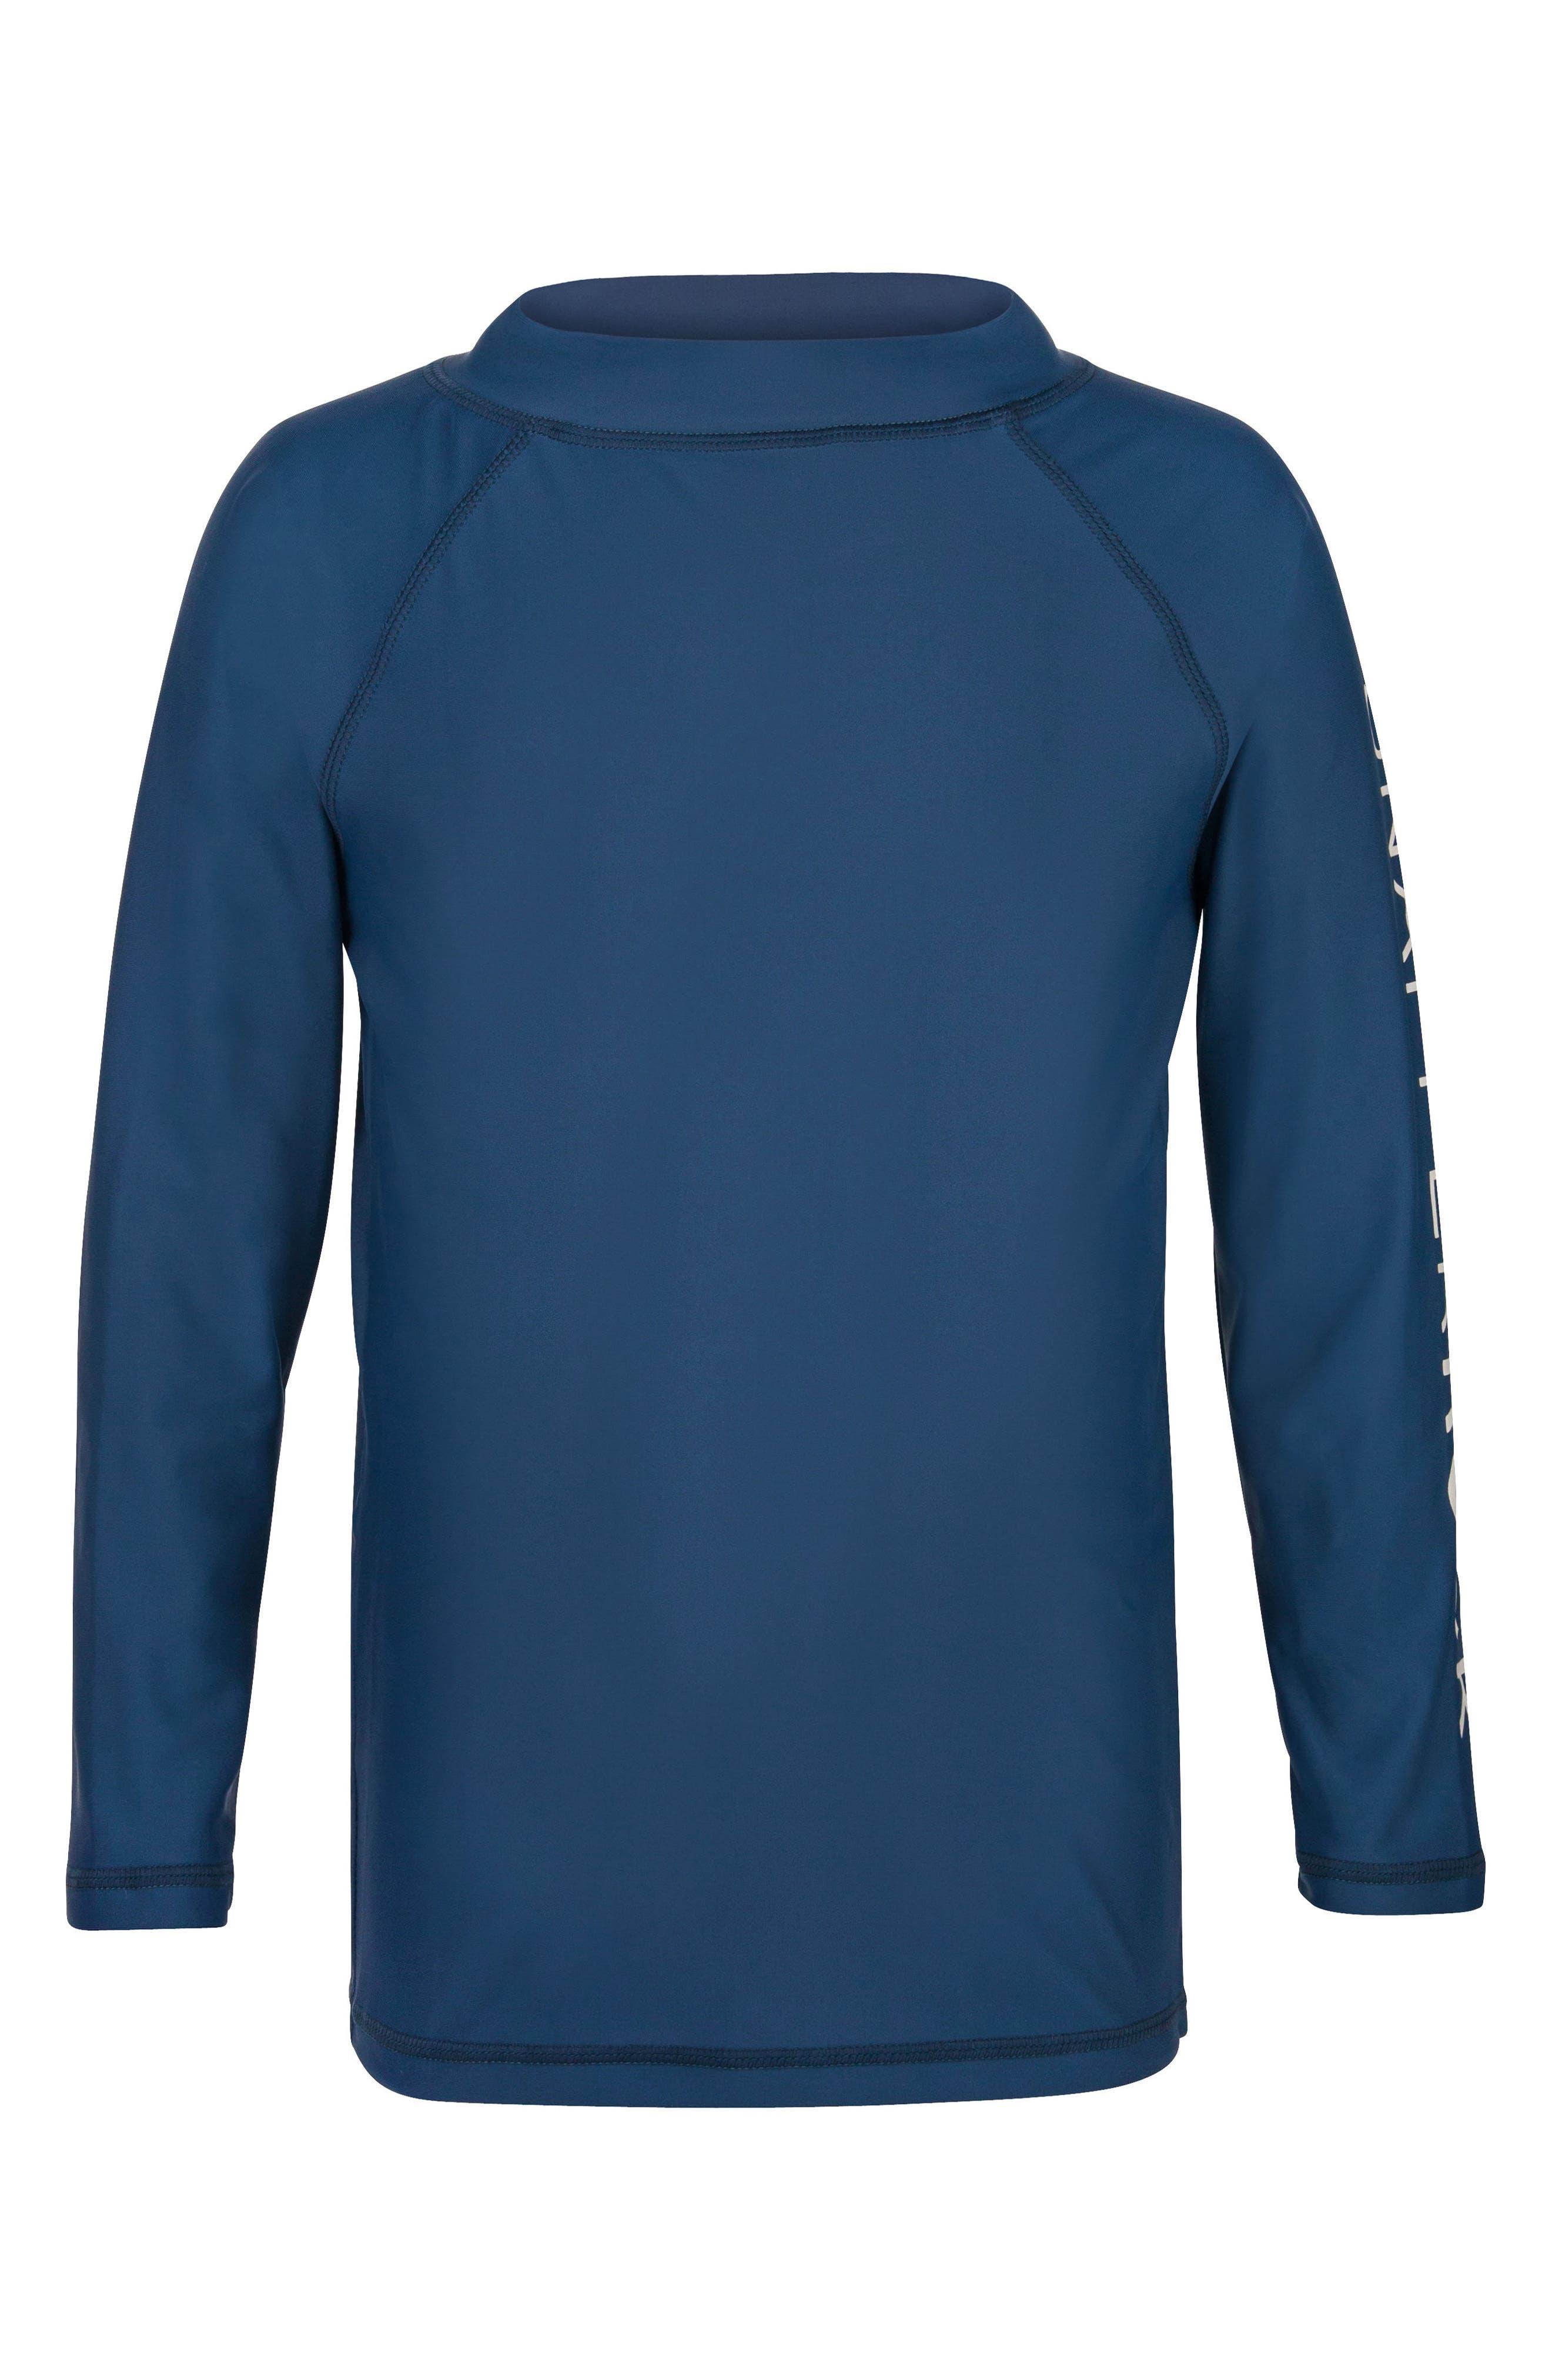 Raglan Long Sleeve Rashguard,                         Main,                         color, Denim